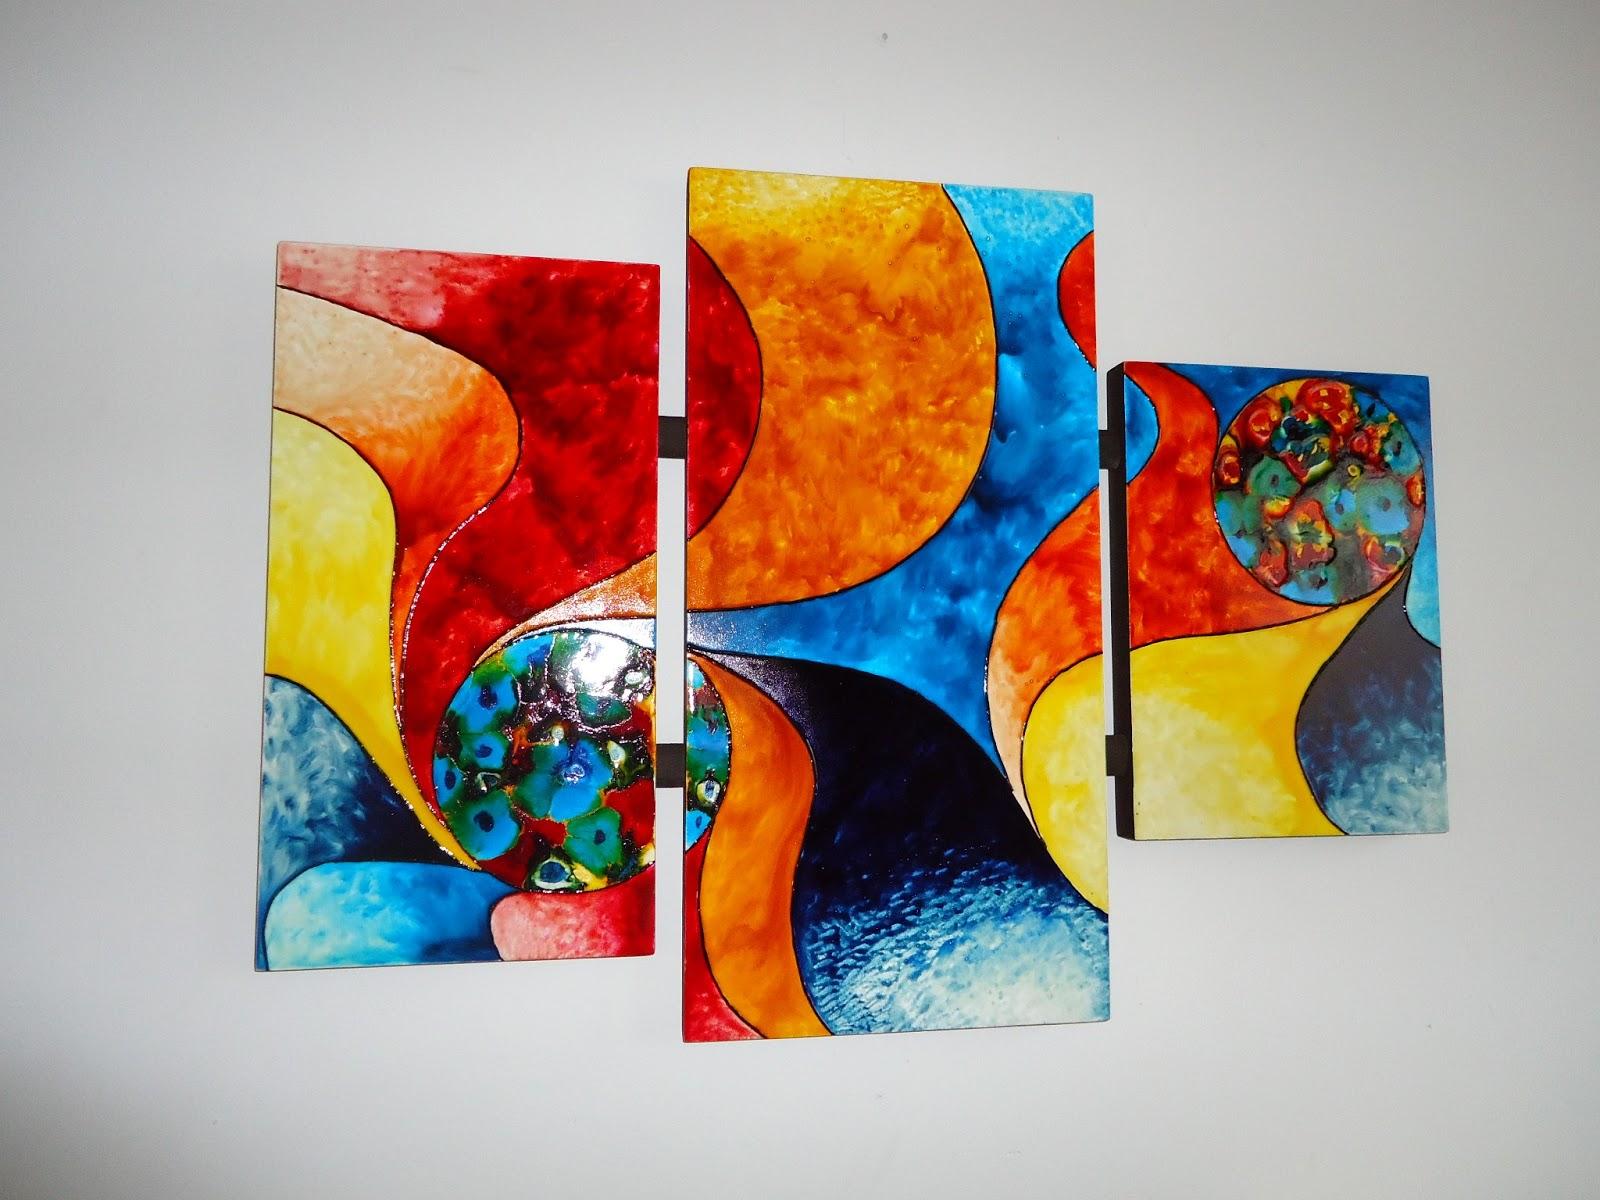 Artes y manualidades cuadros abstractos for Cuadros de manualidades modernos